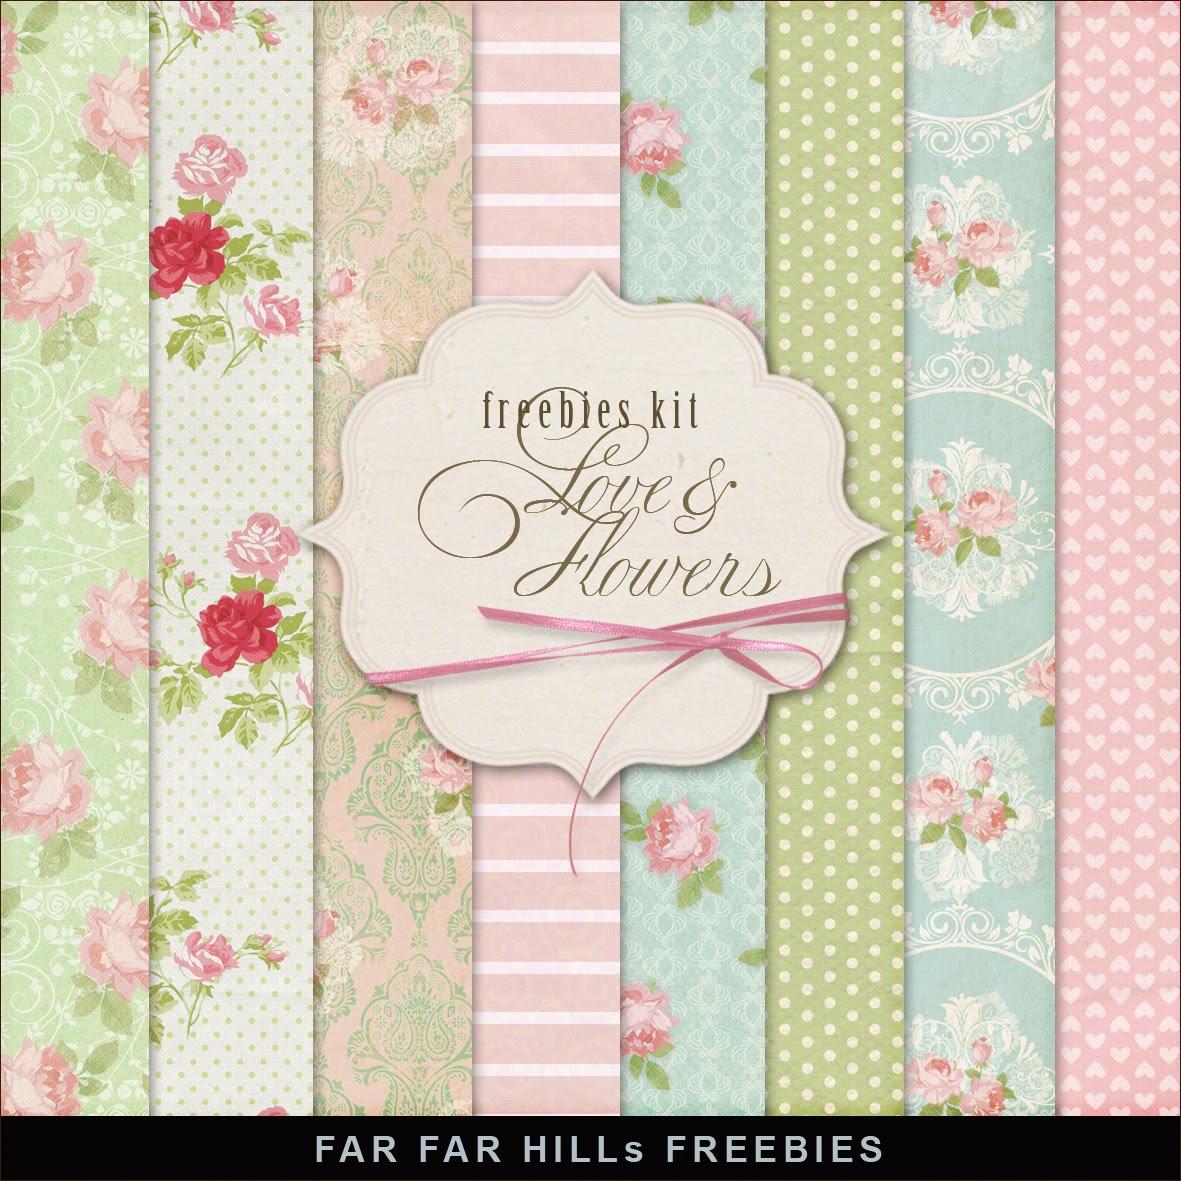 Freebies Kit of Backgrounds - Love & Flowers